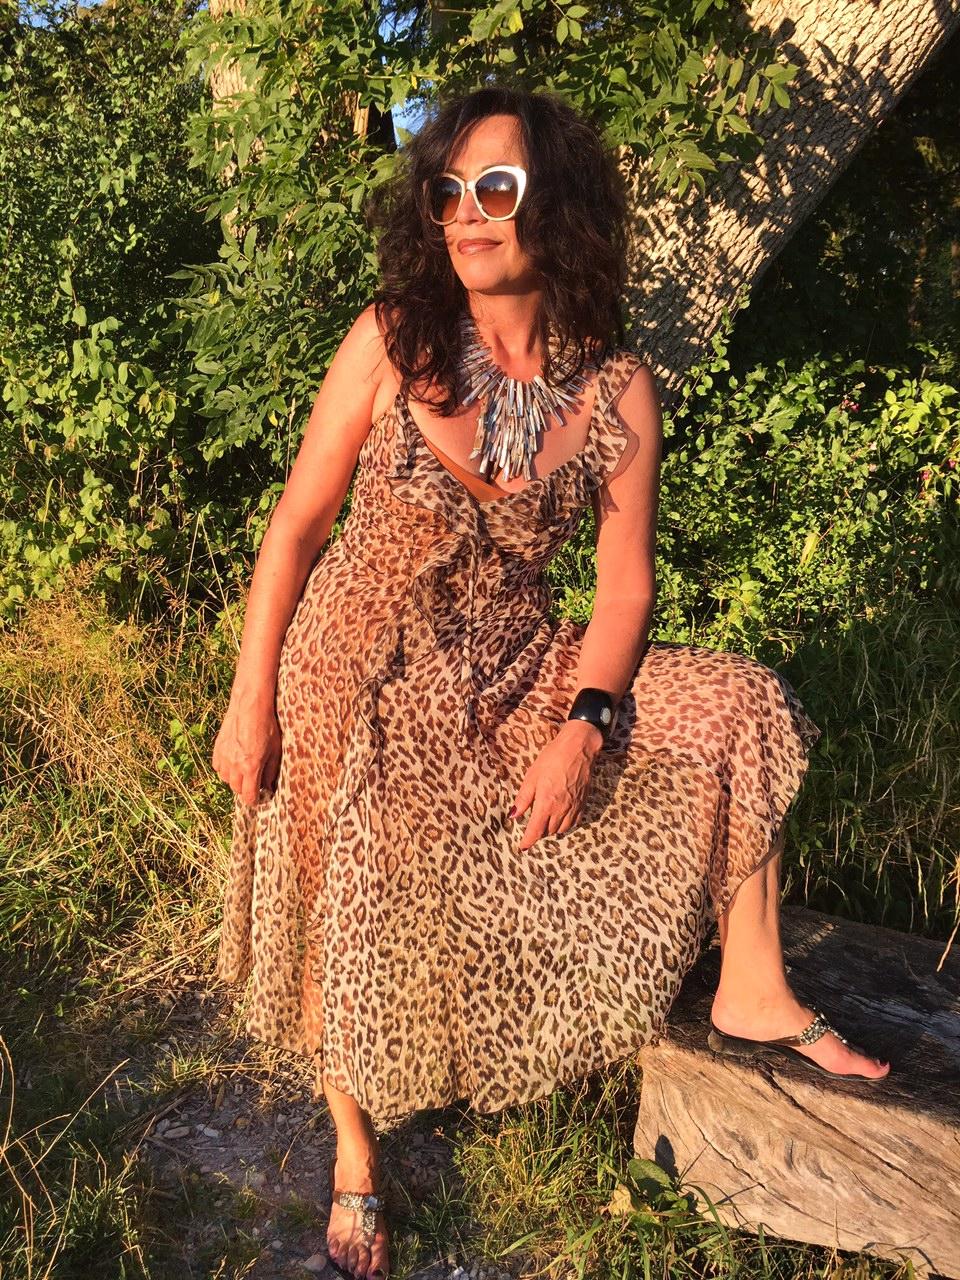 Leoprint, summerlook, summerstyle, fashion, ageless, dolce gabbana, silk, sunnies, sun, leo, chanel, nature, summerdress